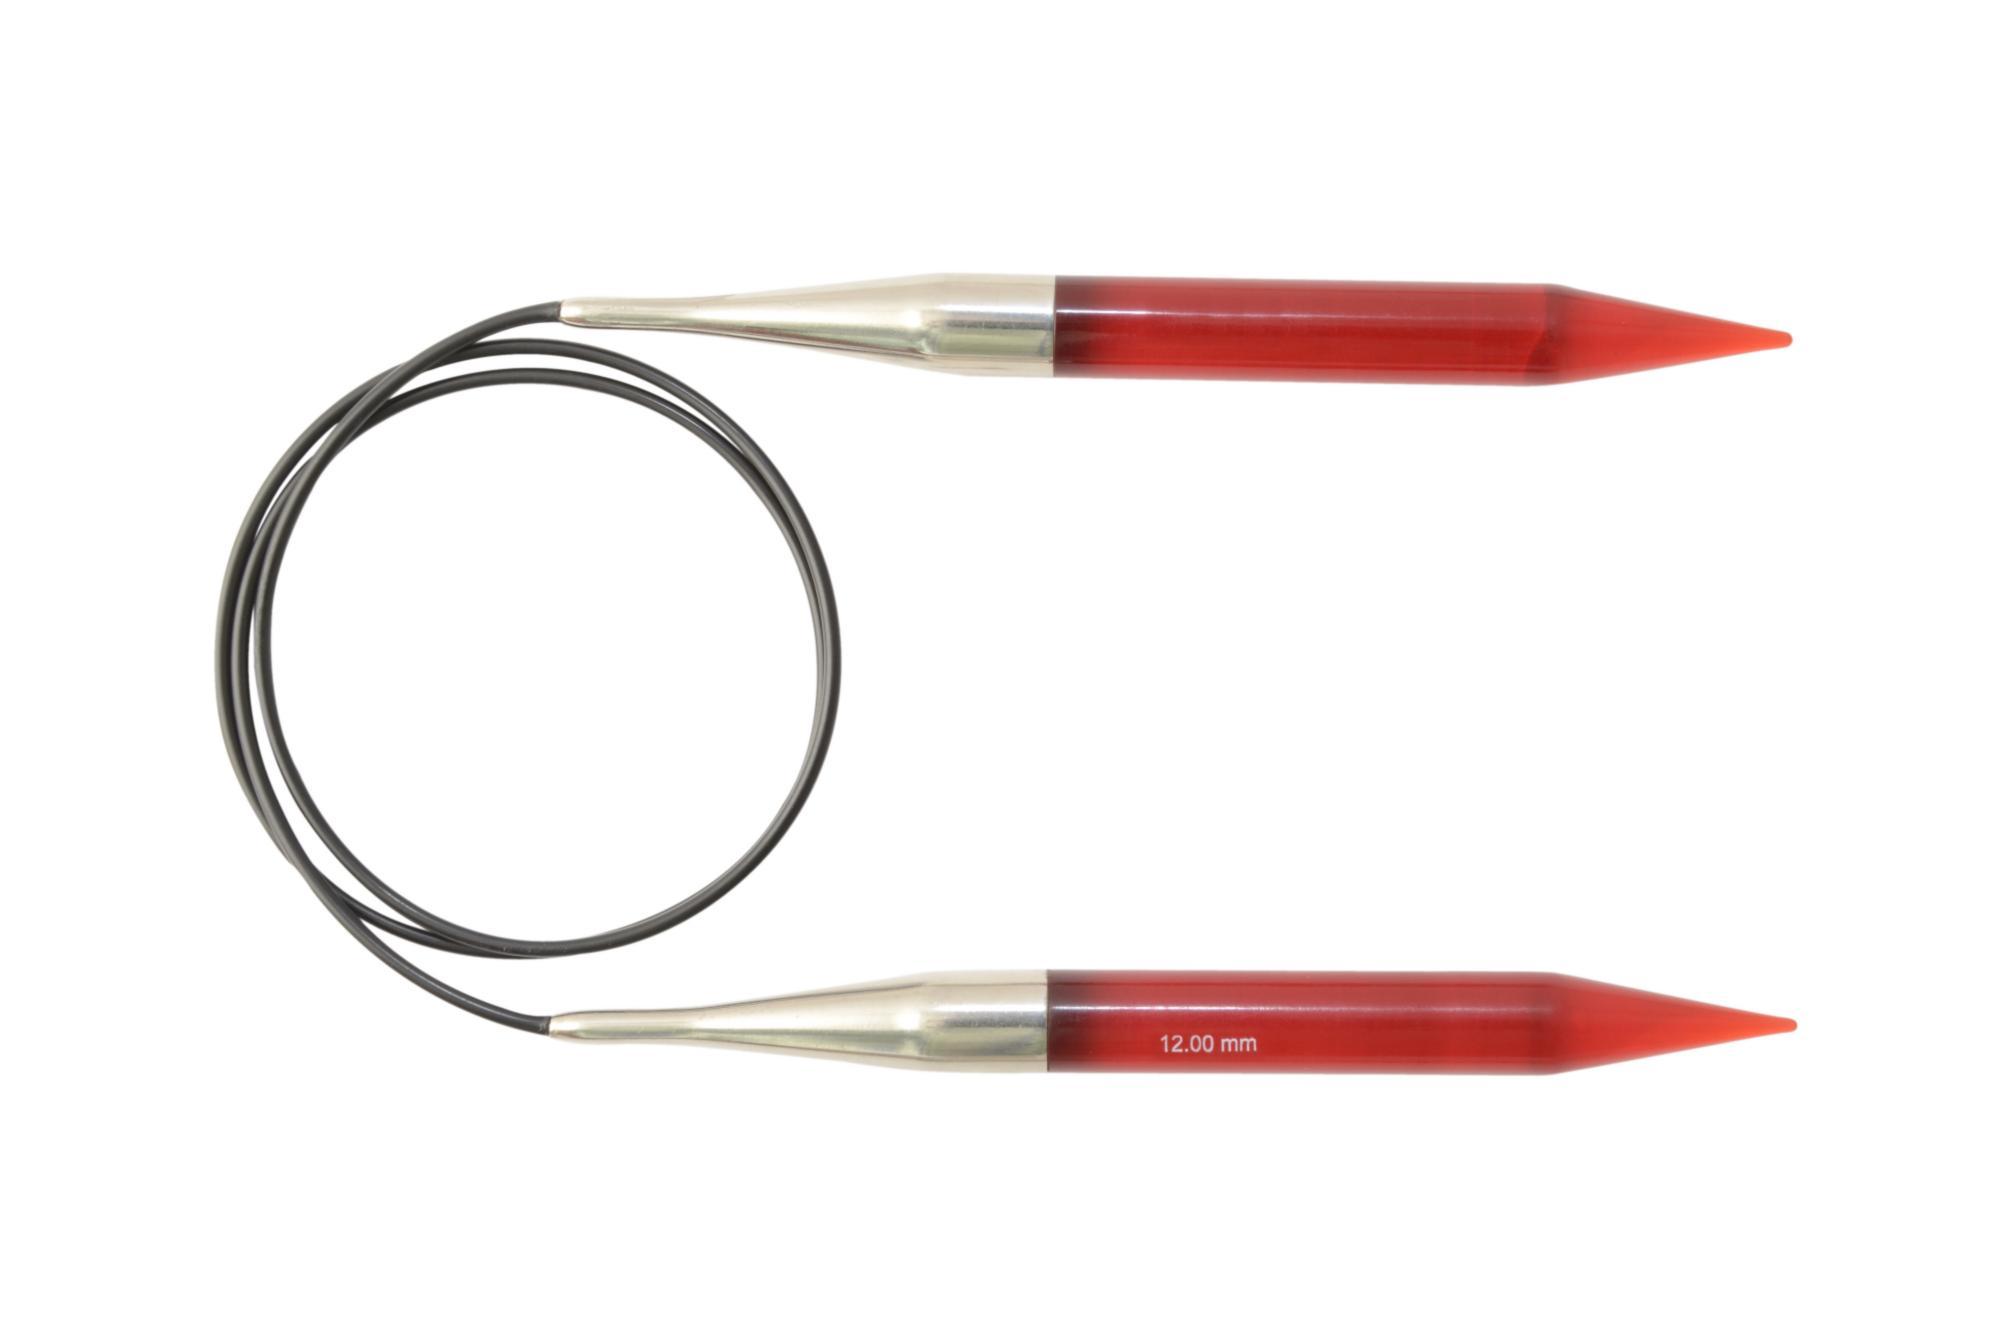 Спицы круговые 100 см Trendz KnitPro, 51123, 12.00 мм